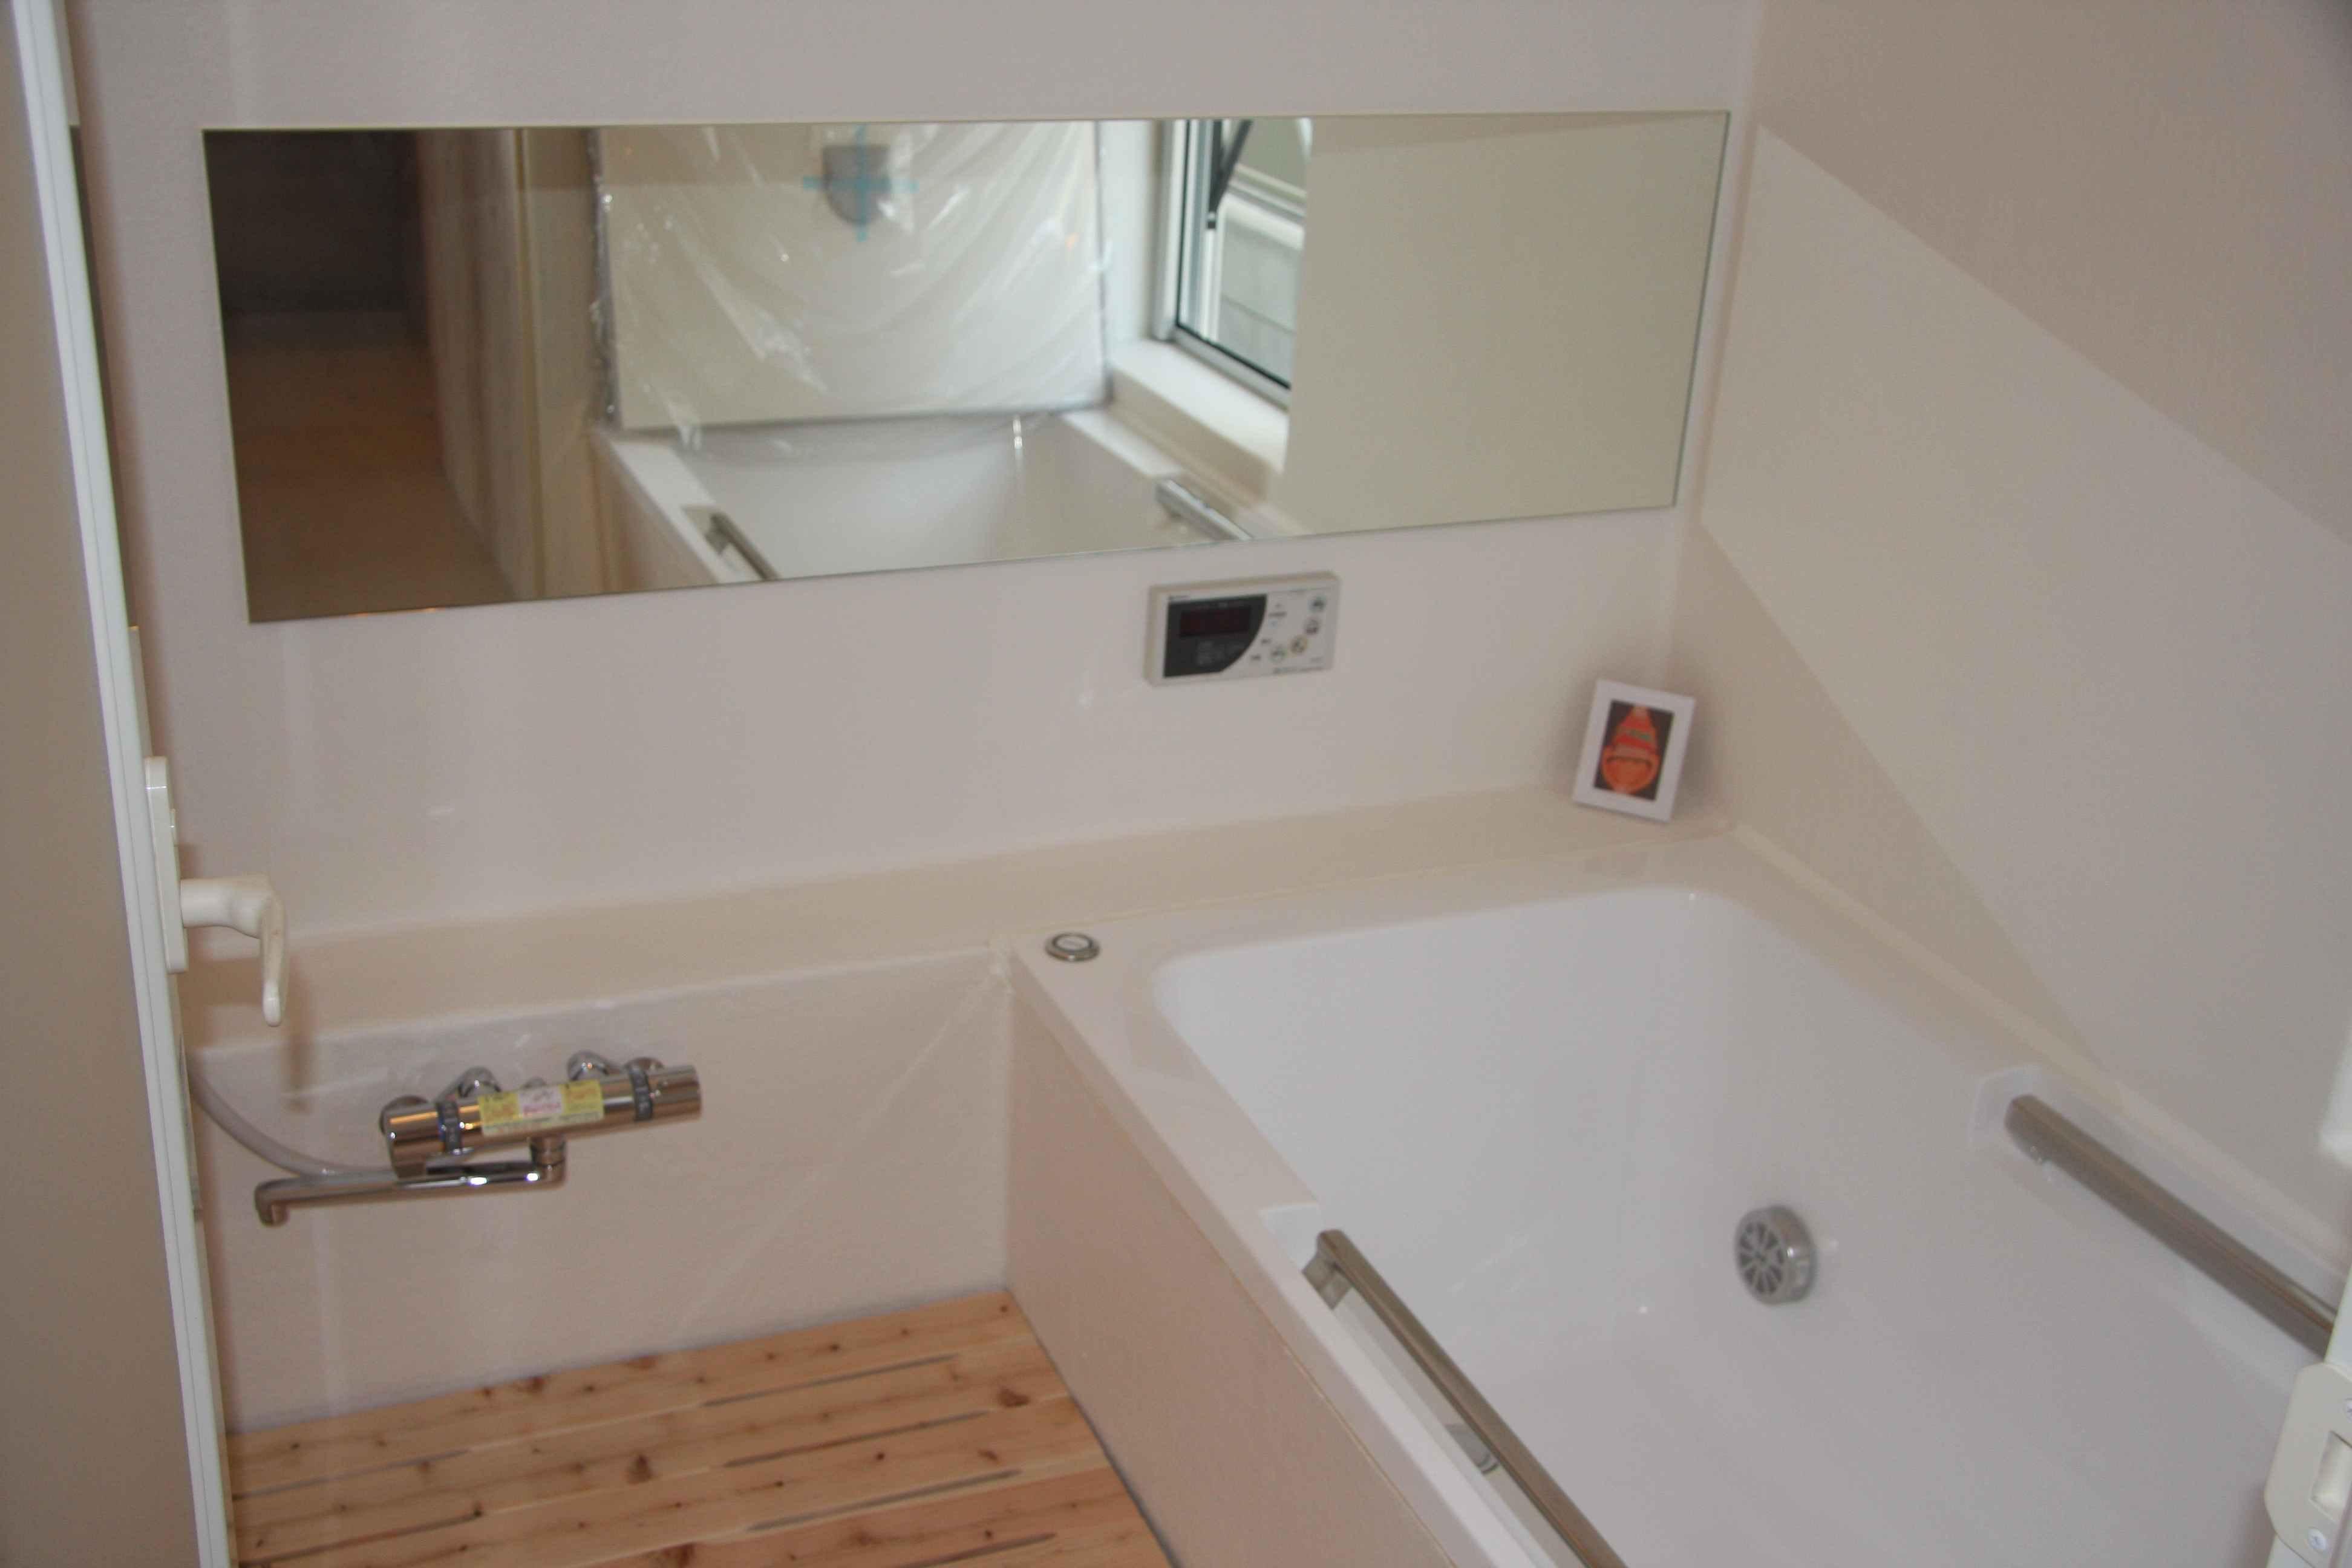 浴室 Frp防水 仕上げ